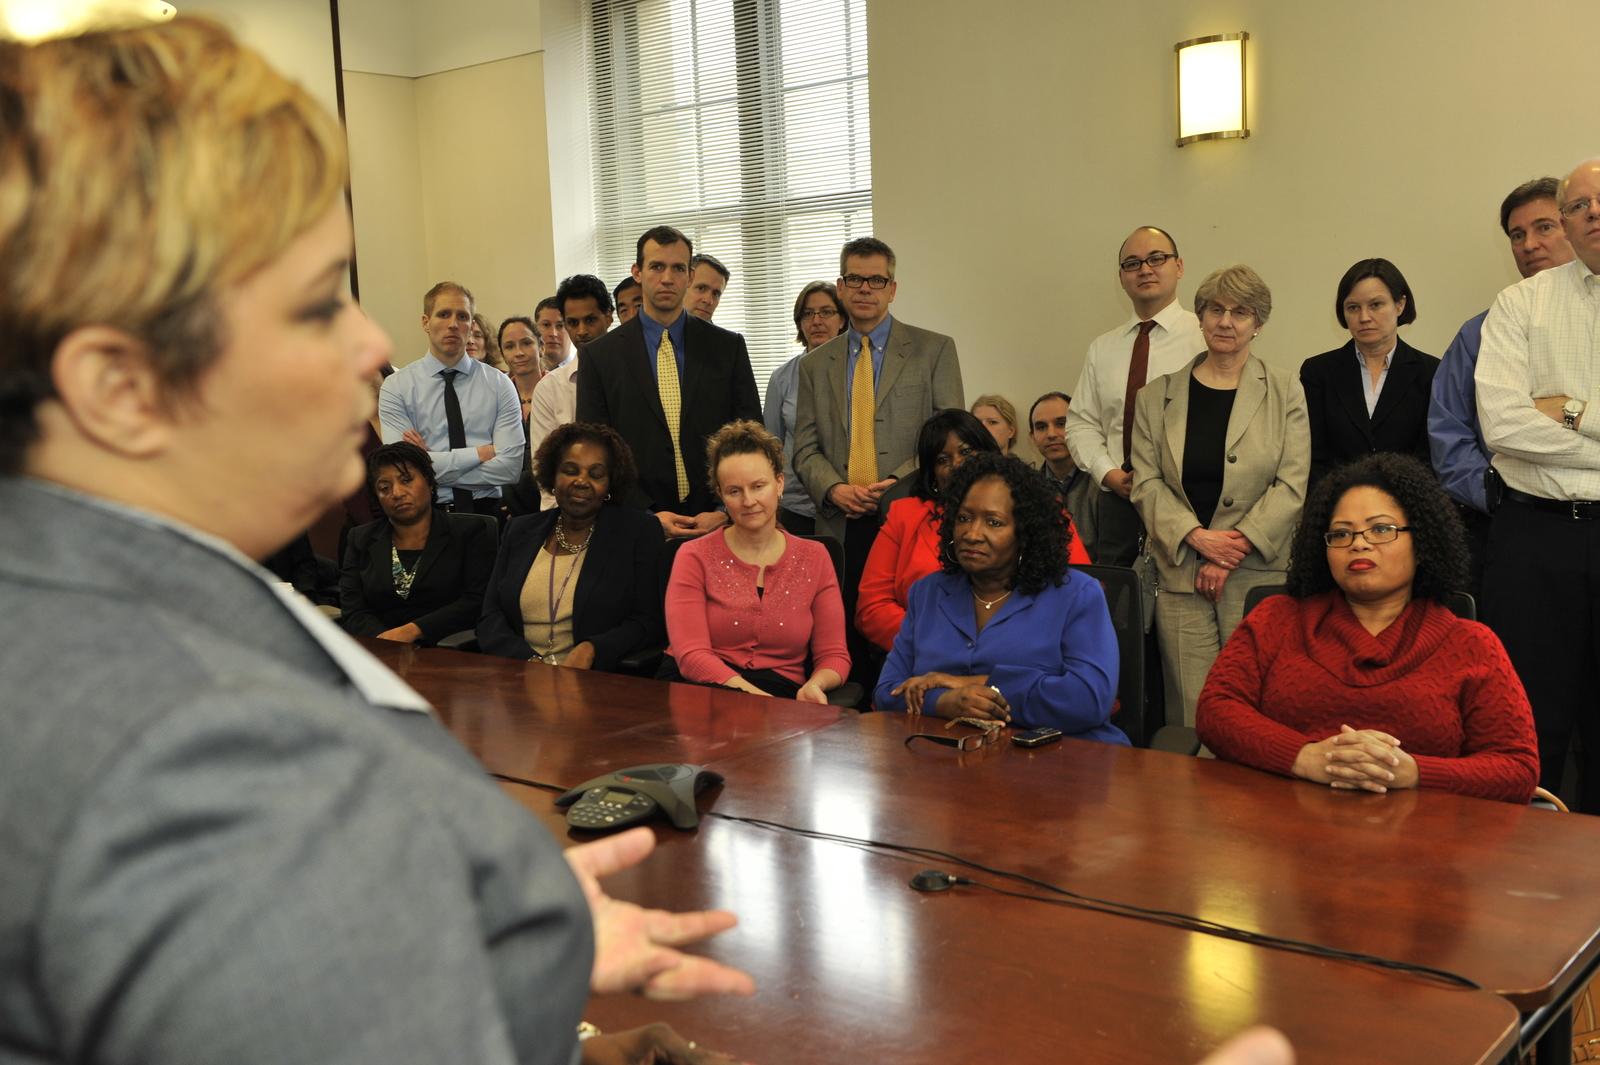 Office of the Administrator - Lisa Jackson's Farewell Tour [412-APD-1115-2013-02-07_FarewellTour_169.JPG]